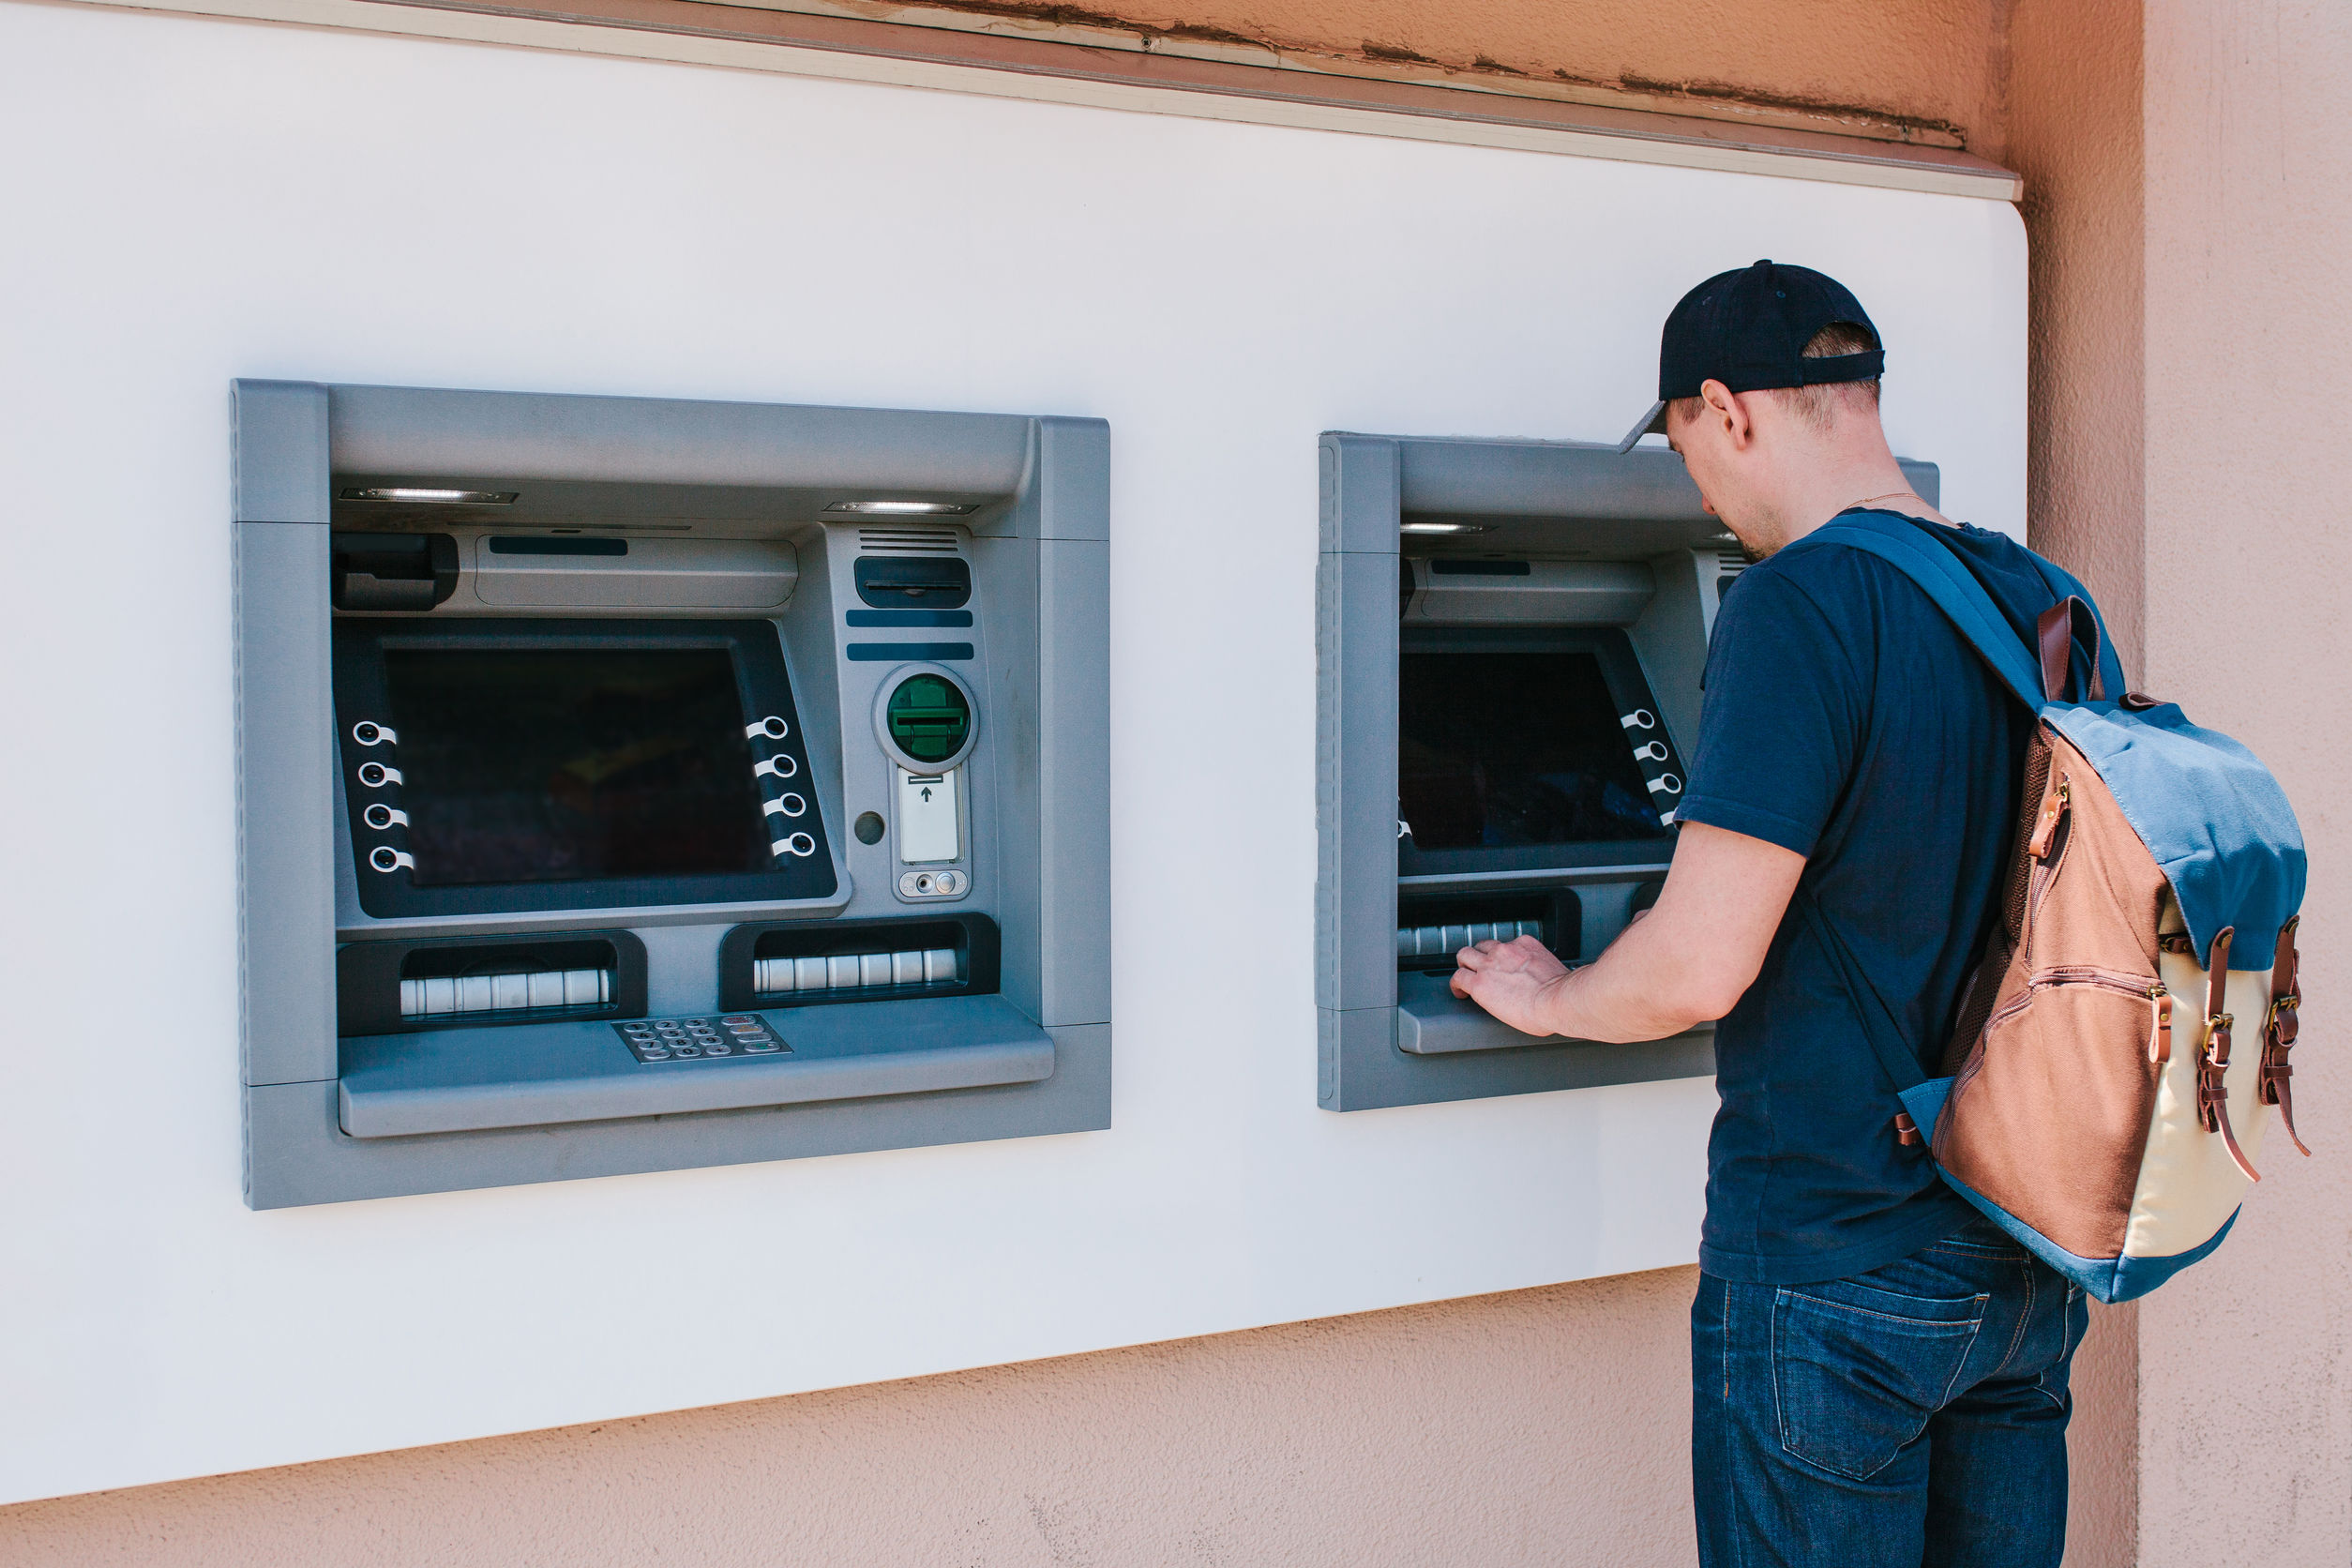 Berapa Sih Maksimal Transfer ATM BNI?